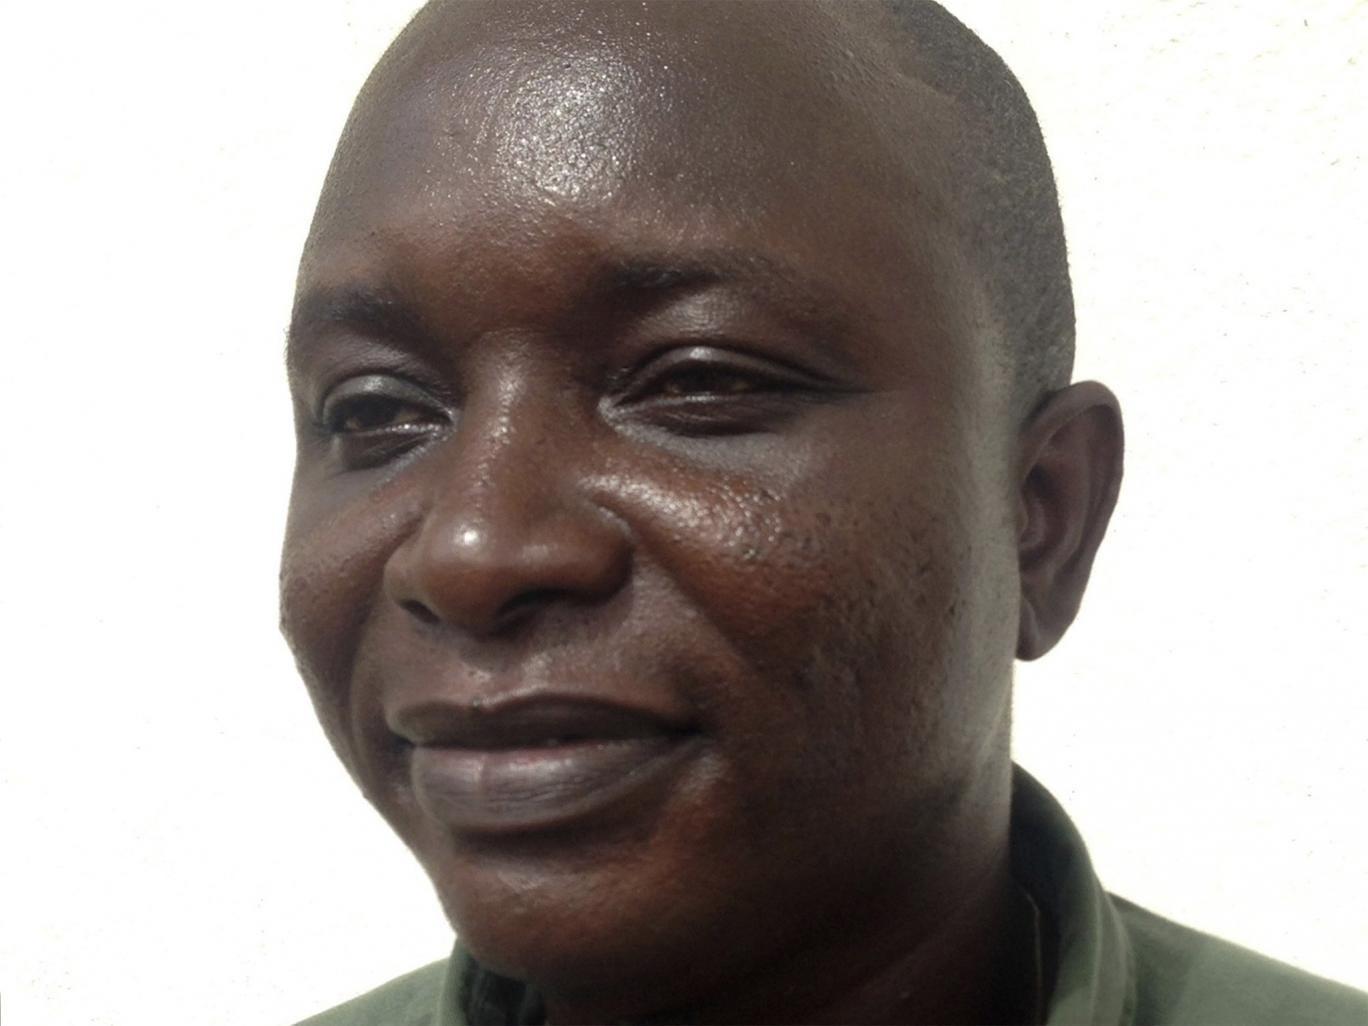 Sheikh Umar Khan, who has treated 100 Ebola victims, said: 'I am afraid for my life'